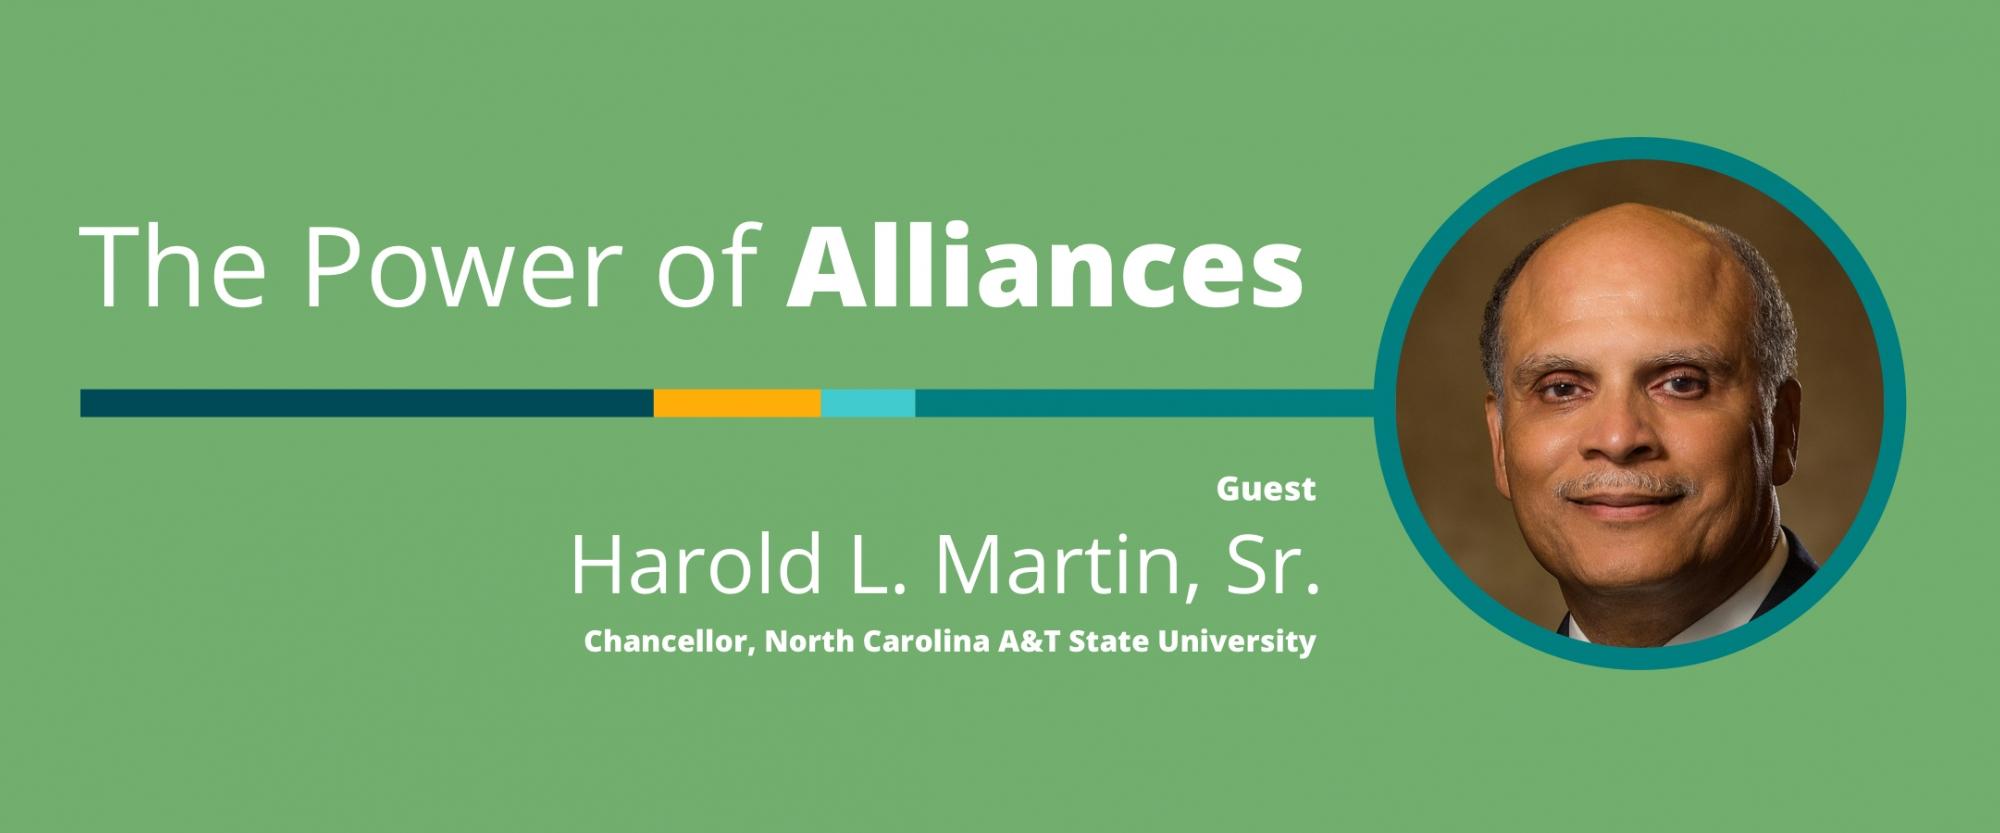 The Power of Alliances